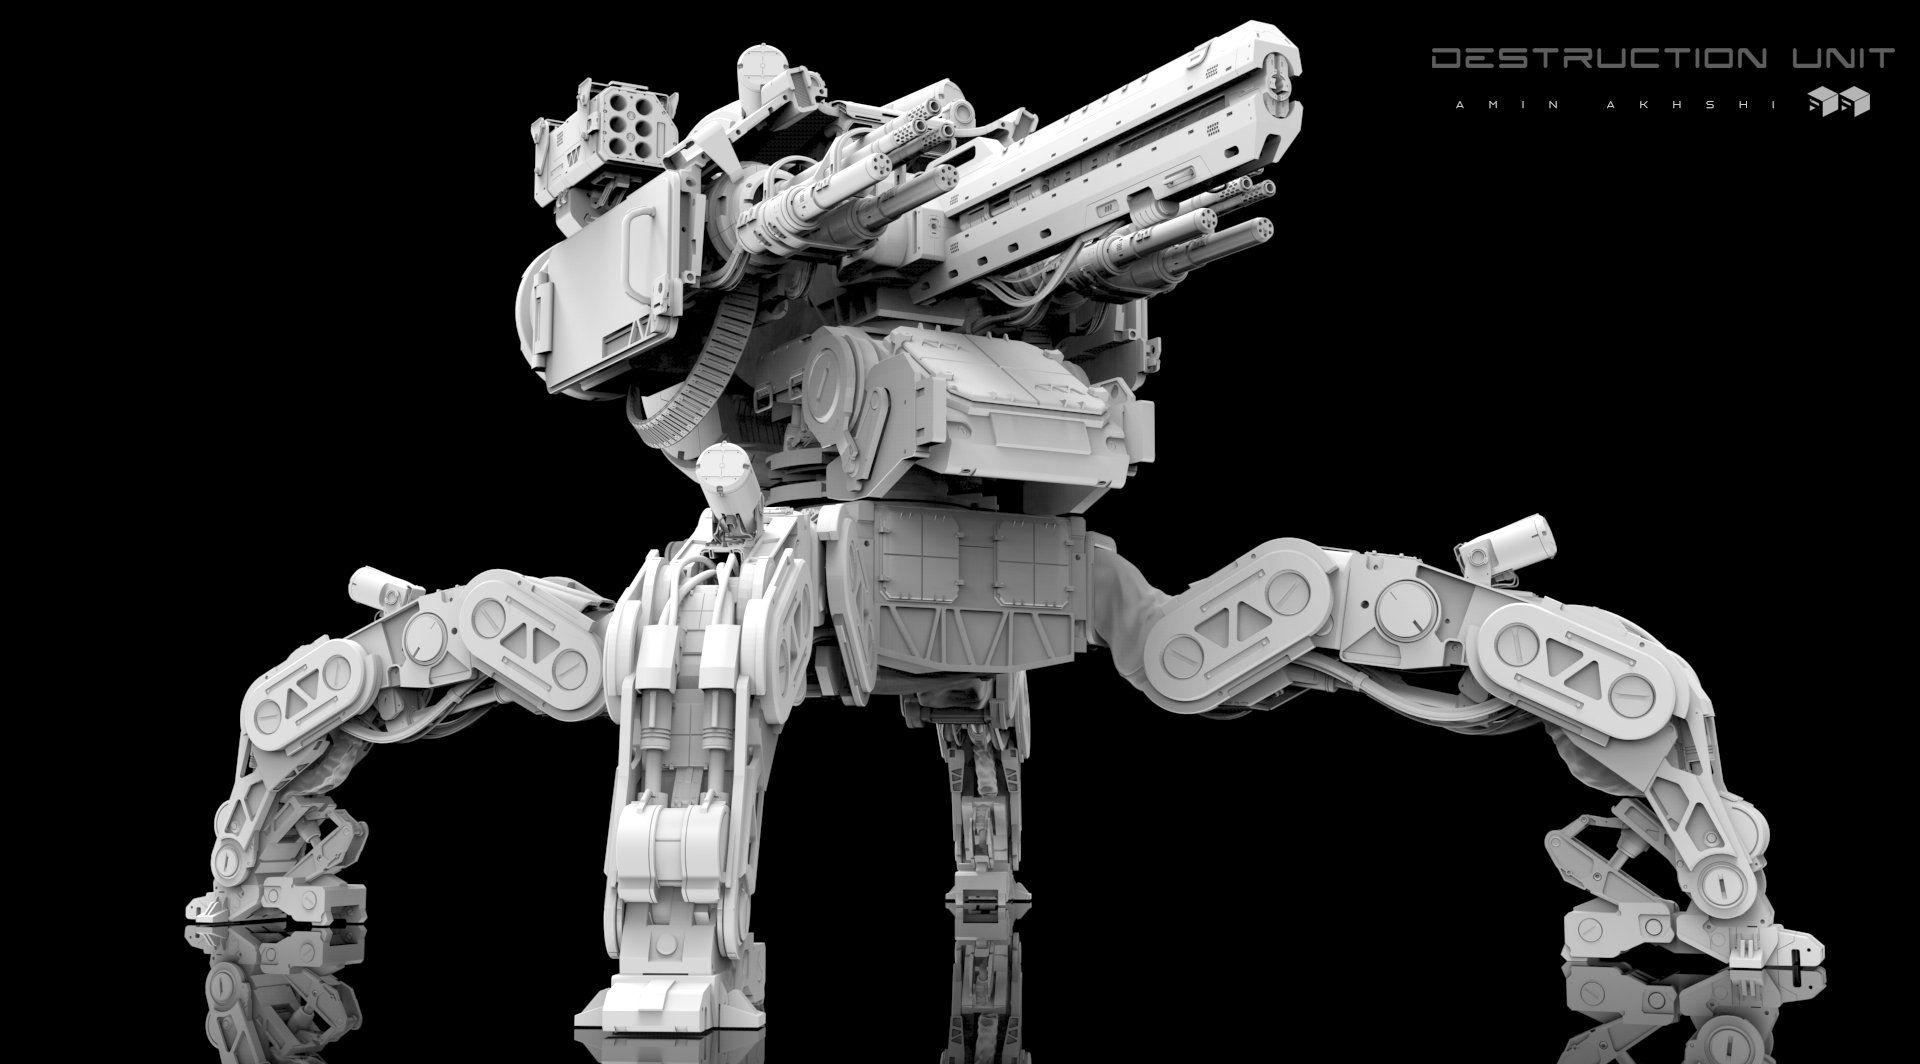 ArtStation - Destruction Unit ! clay render , Amin Akhshi